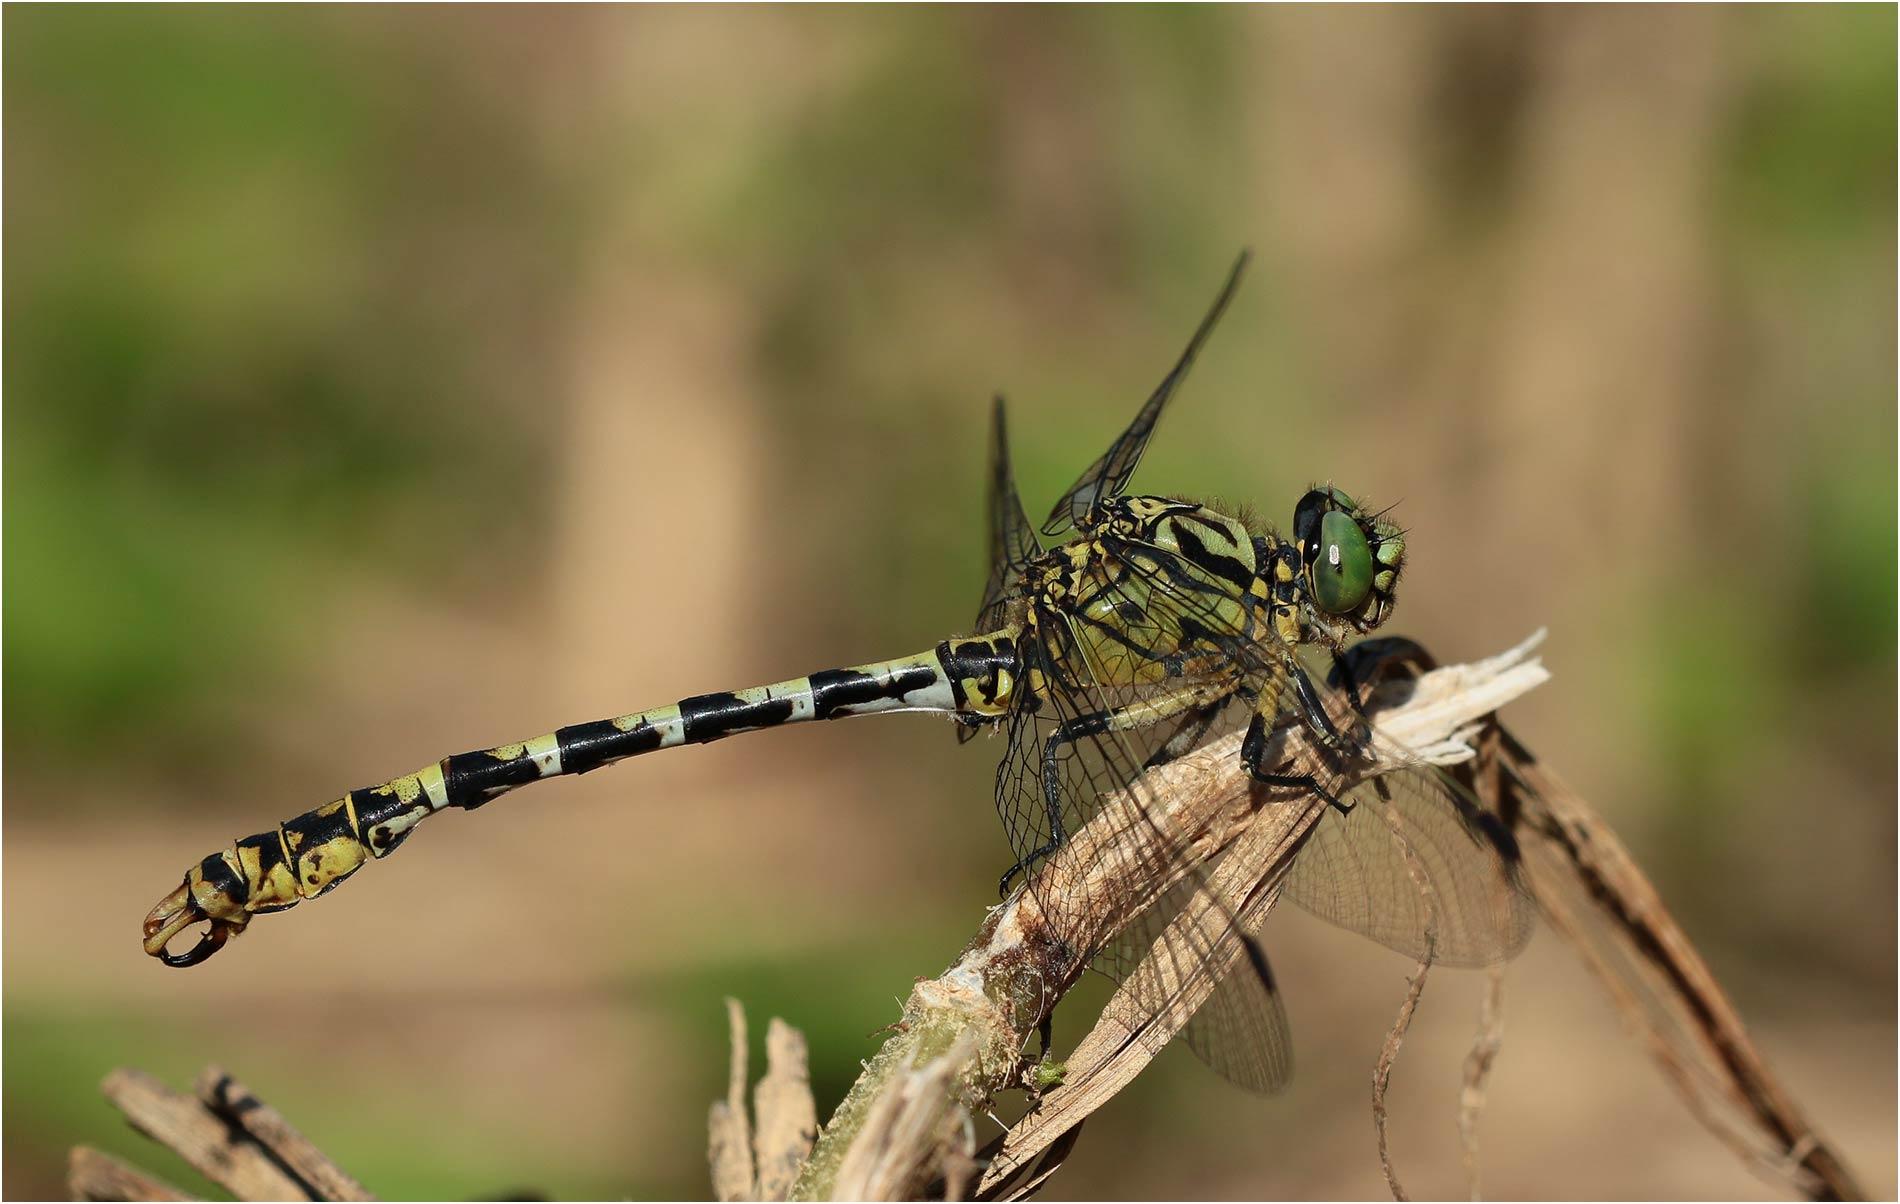 Onychogomphus forcipatus mâle, Sort en Chalosse (France-40), 06/07/2020